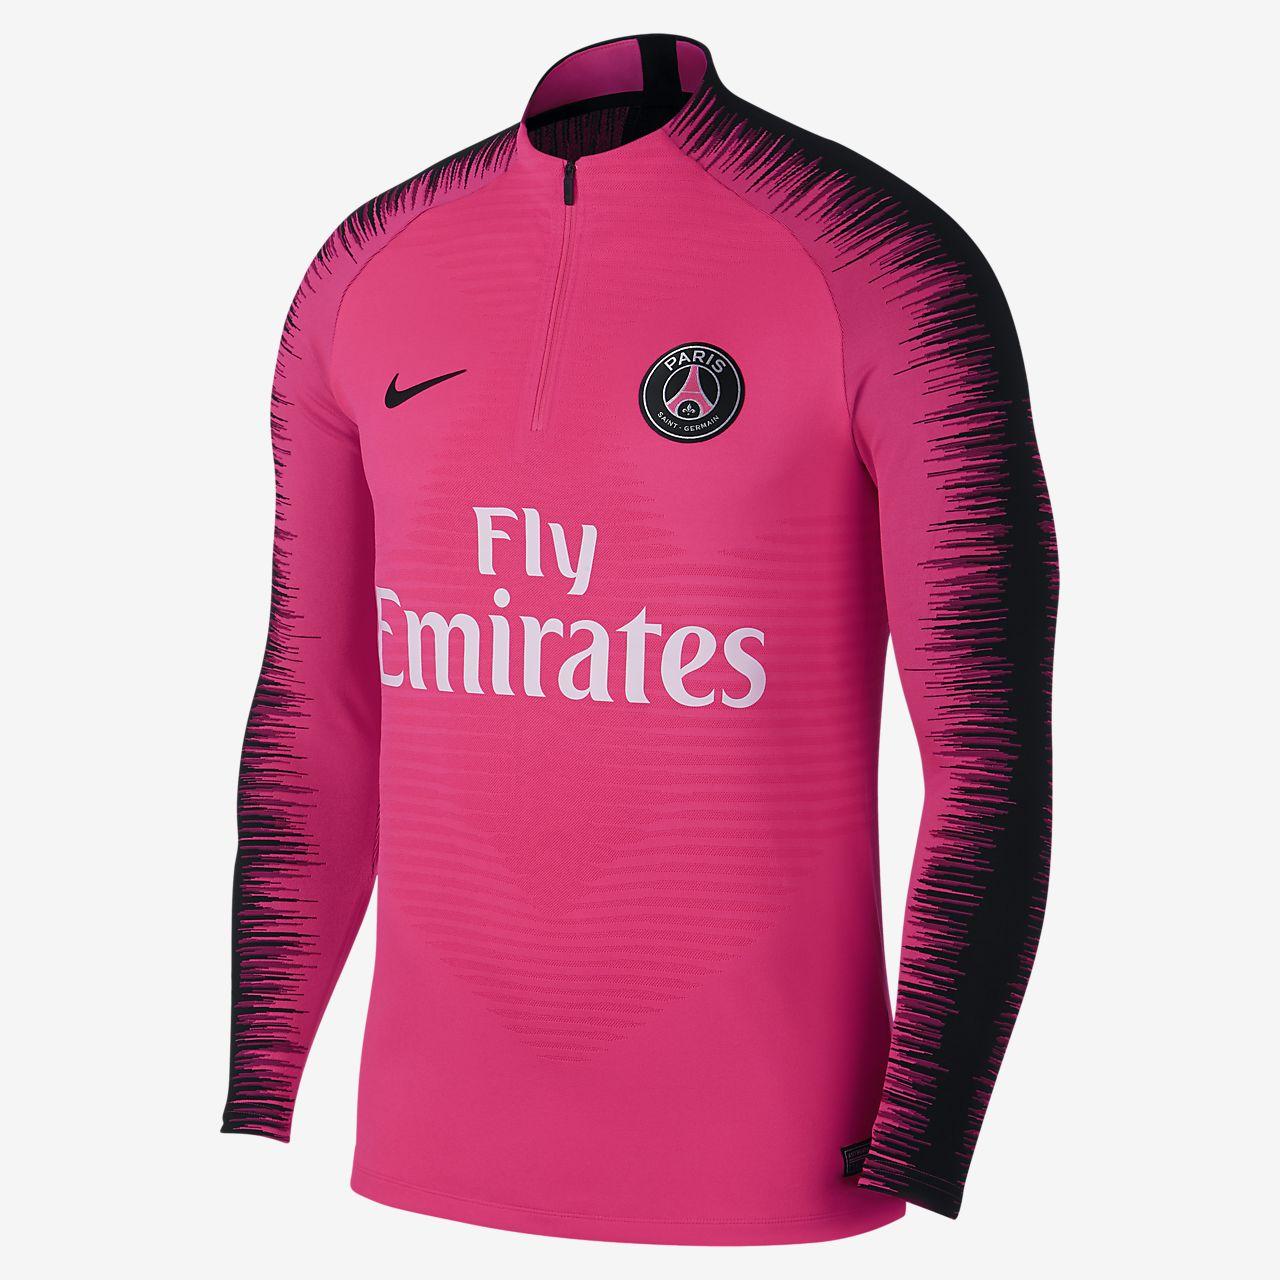 Męska koszulka piłkarska z długim rękawem Paris Saint-Germain VaporKnit Strike Drill